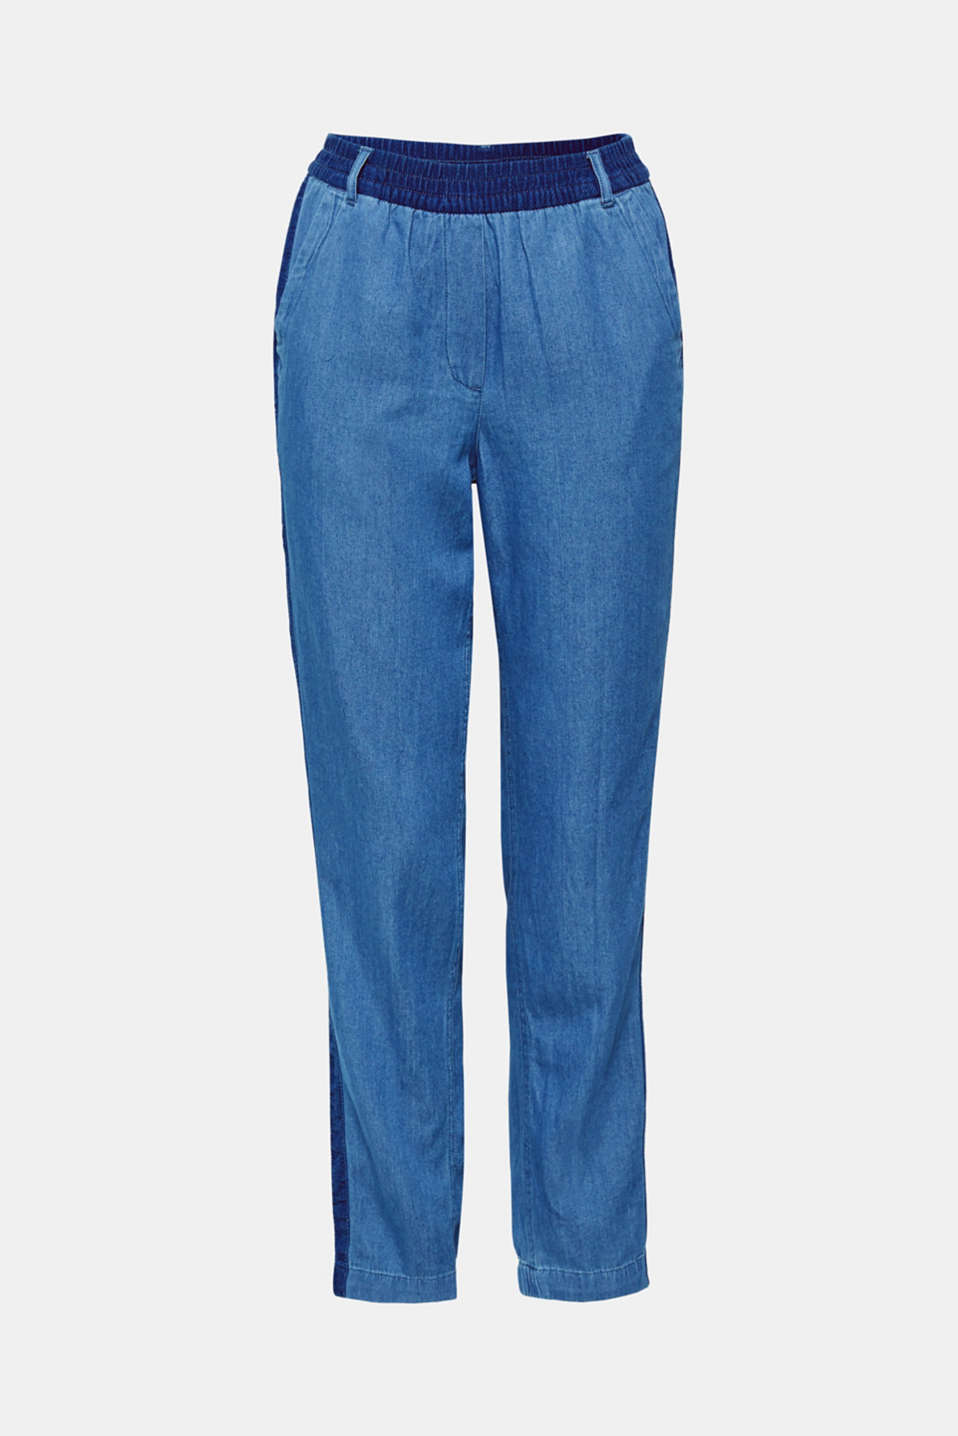 Pants woven, DARK BLUE, detail image number 7